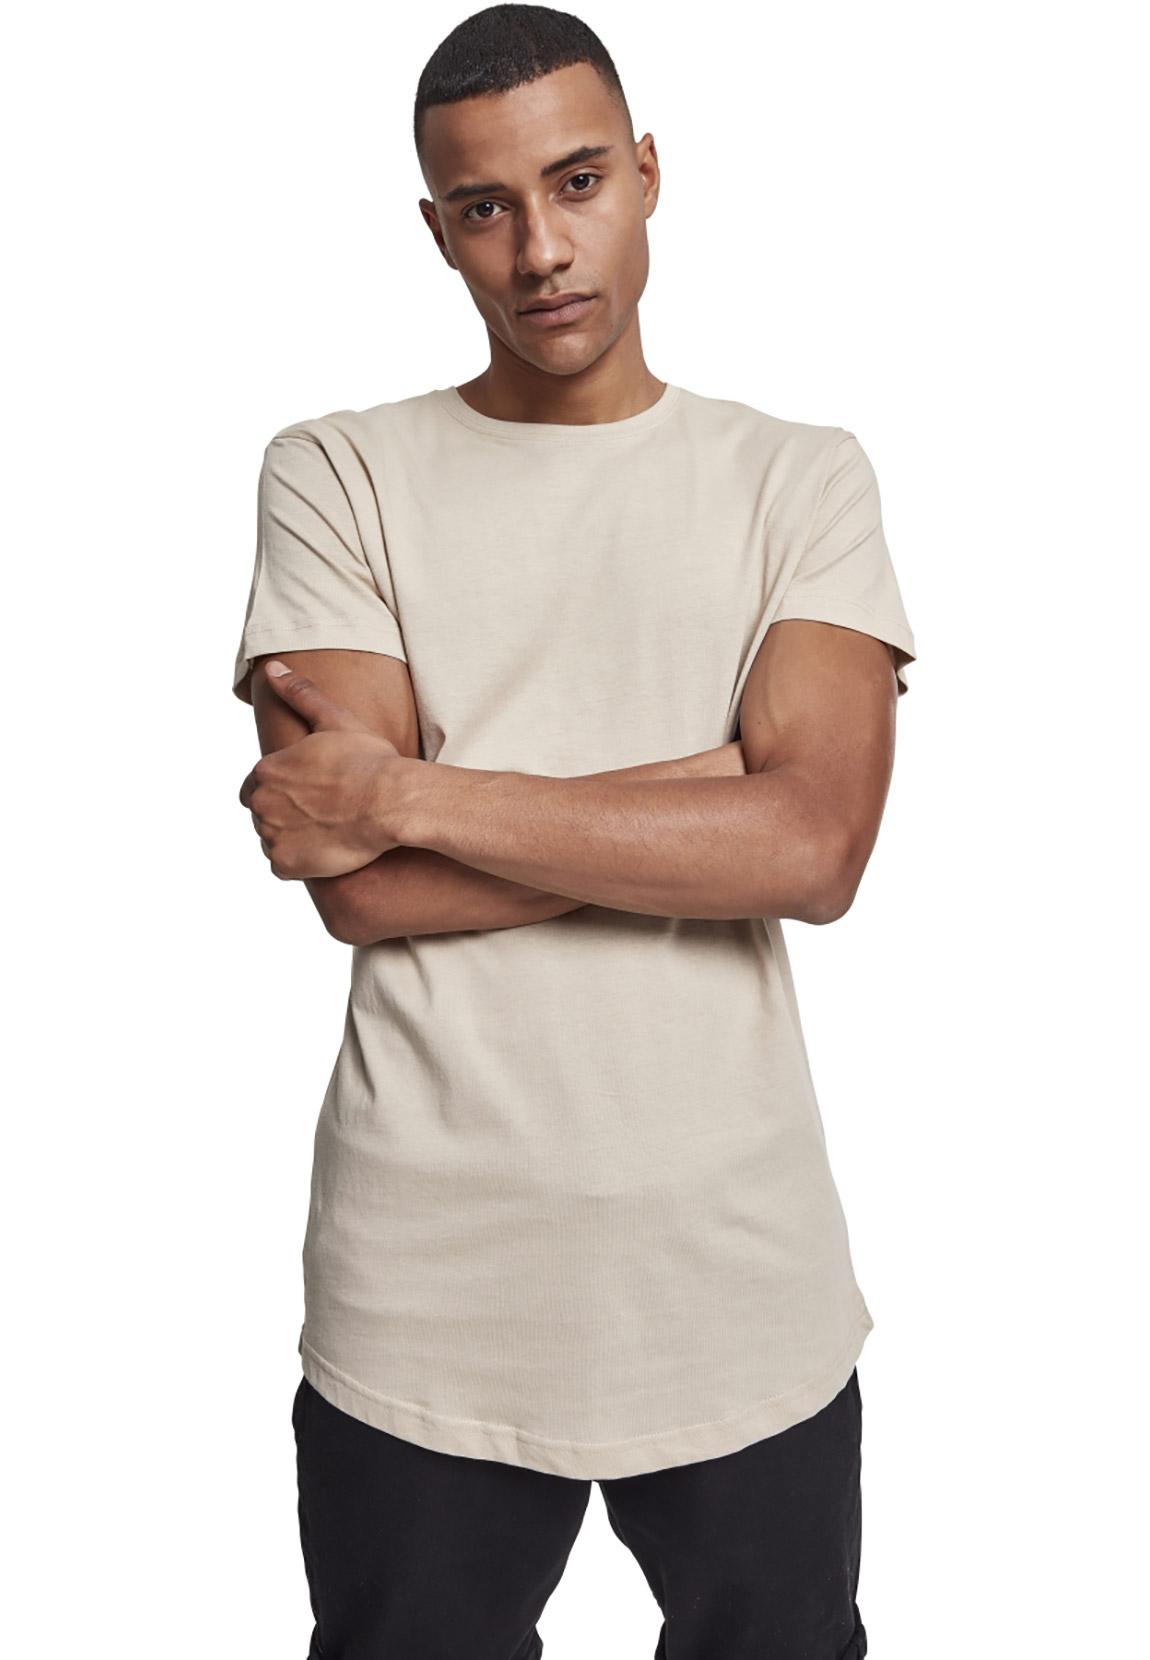 Urban Classics T Shirt Herren SHAPED LONG TEE TB20 Beige Sand    Fashioncode.de Onlineshop